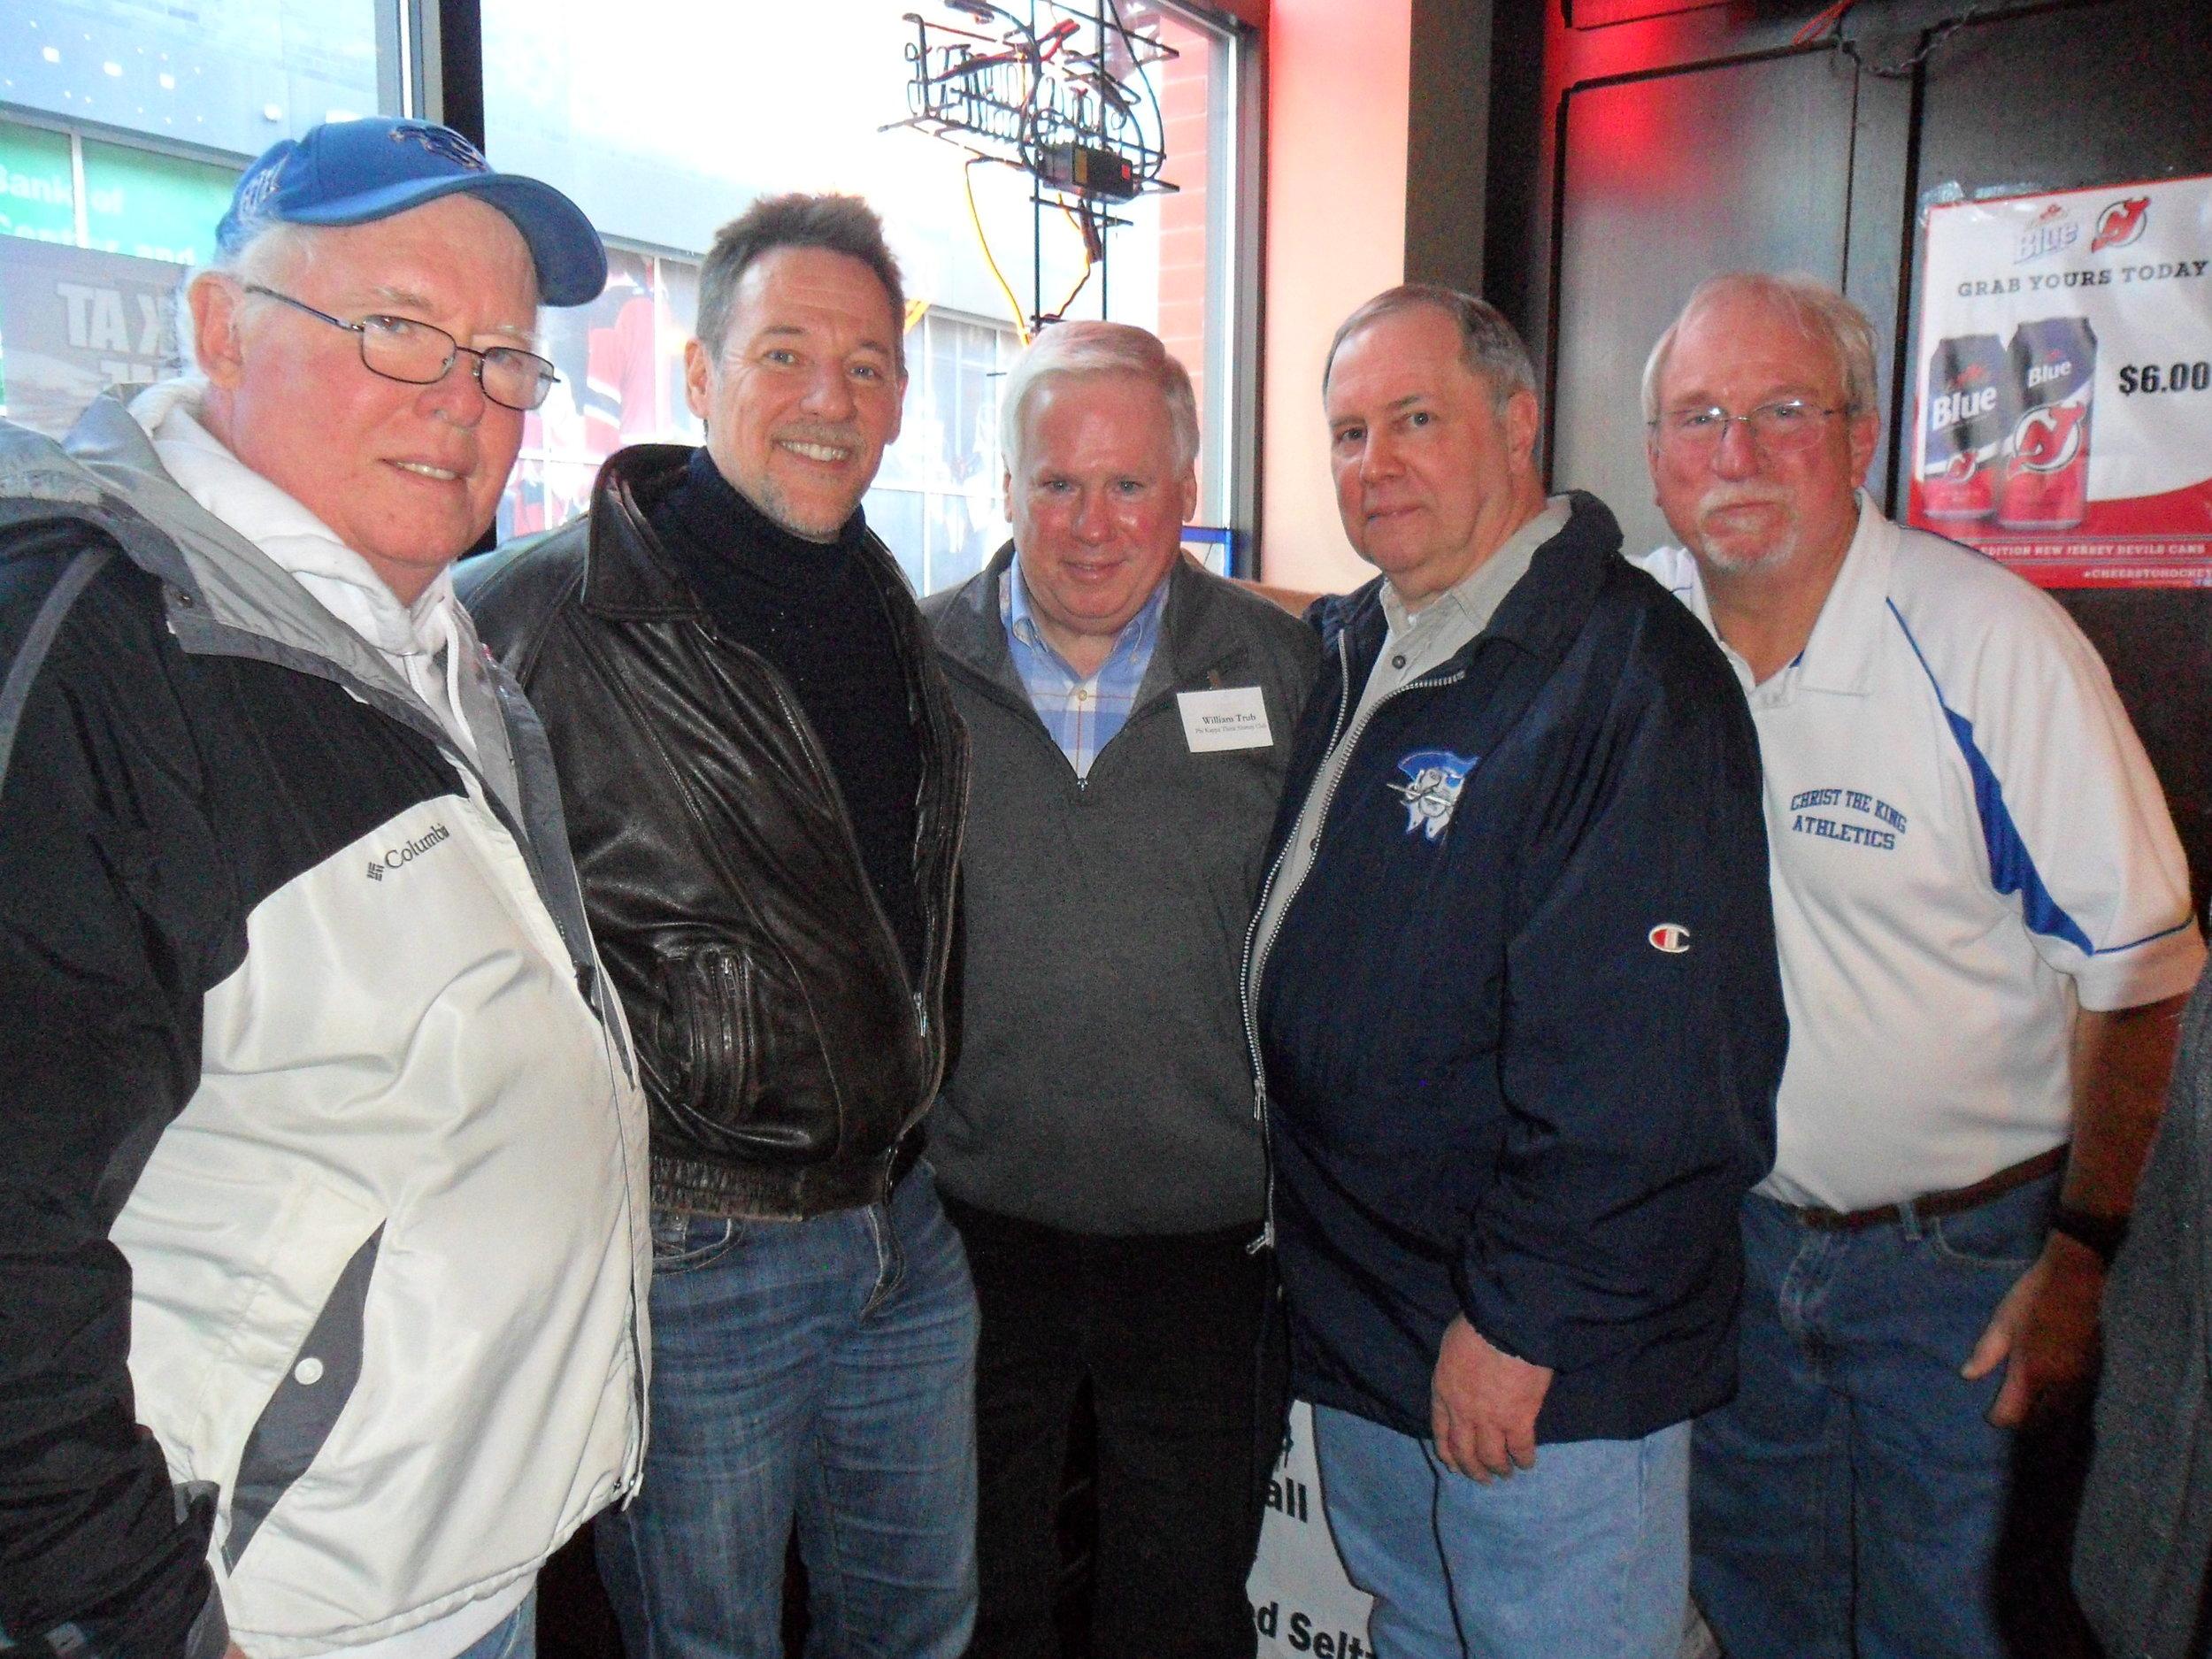 Dennis Reilly, John O'Donnell, Gerry Lenehan, Bill Trub, Chris Kennedy